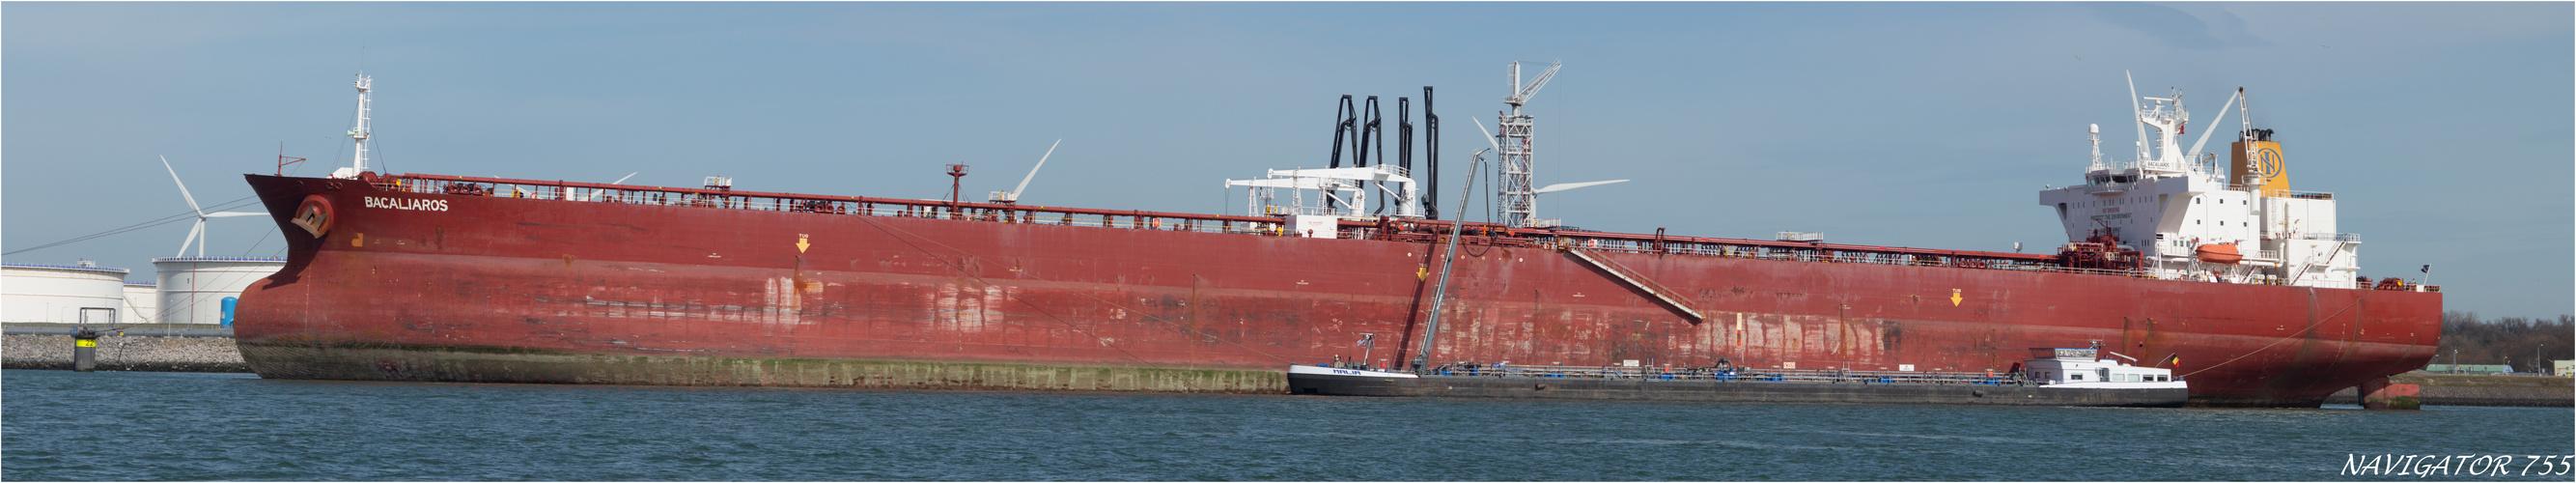 BACALIAROS, Crude Oel Tanker, Rotterdam